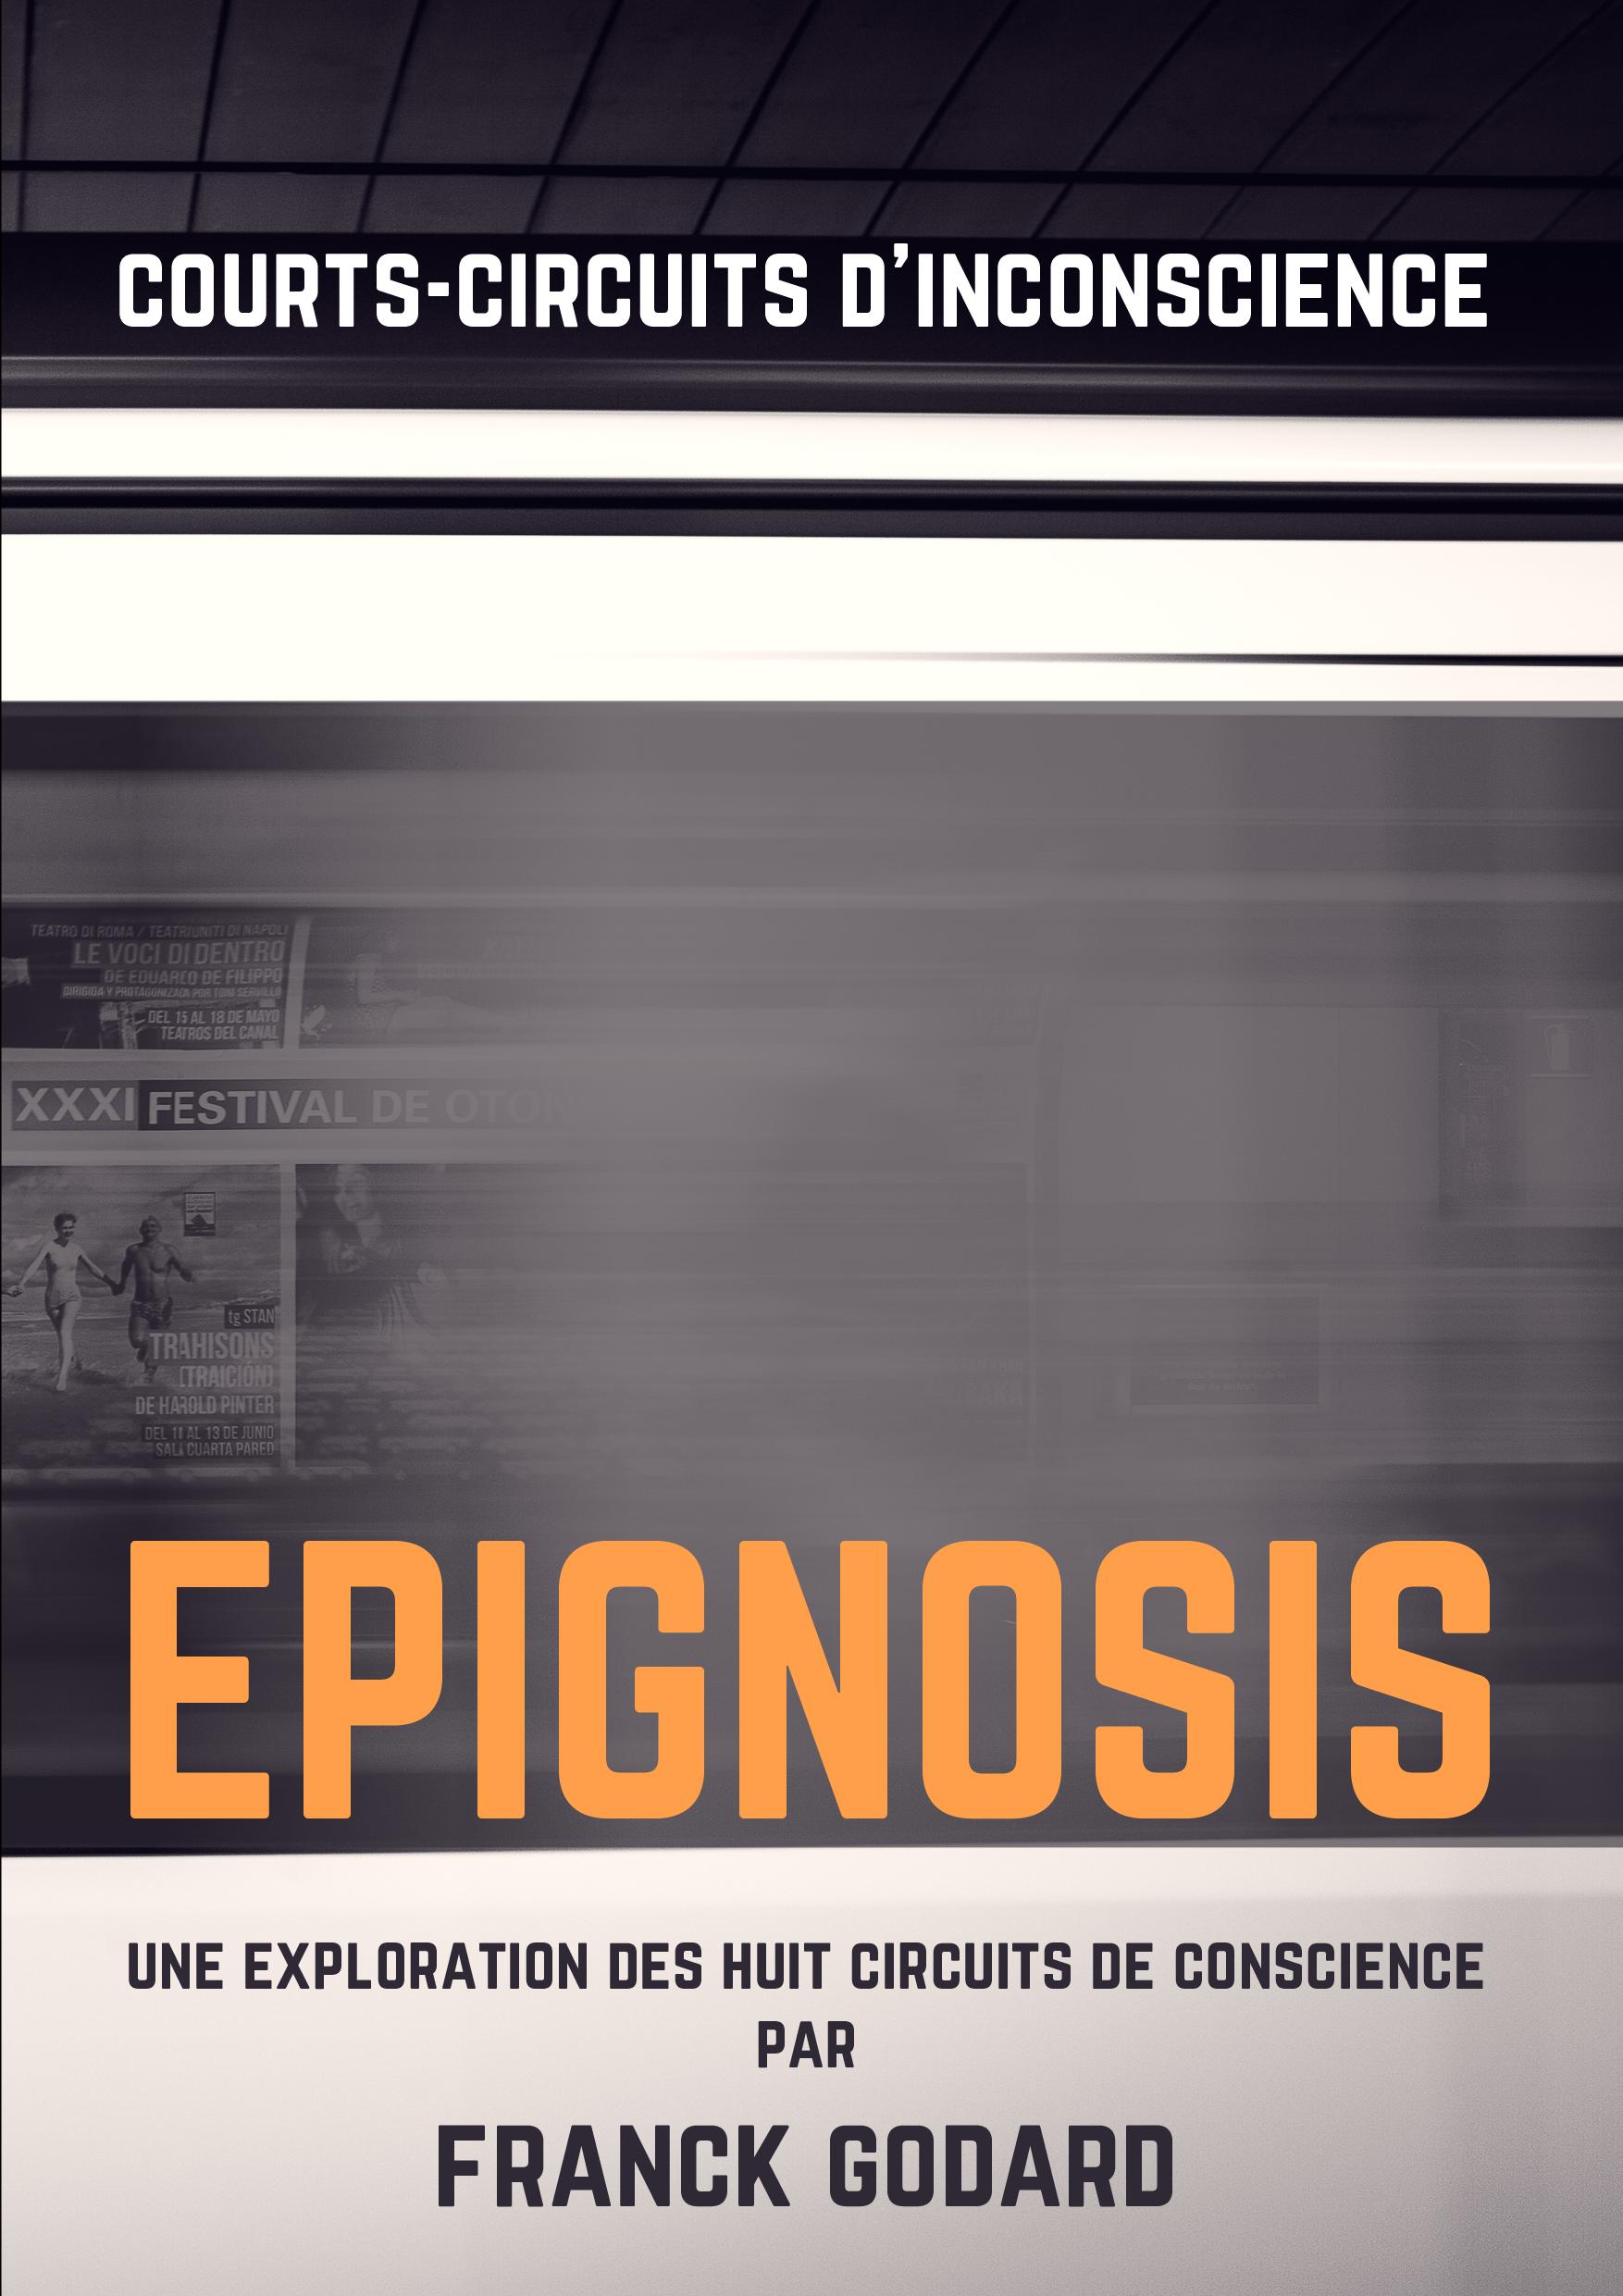 EPIGNOSIS